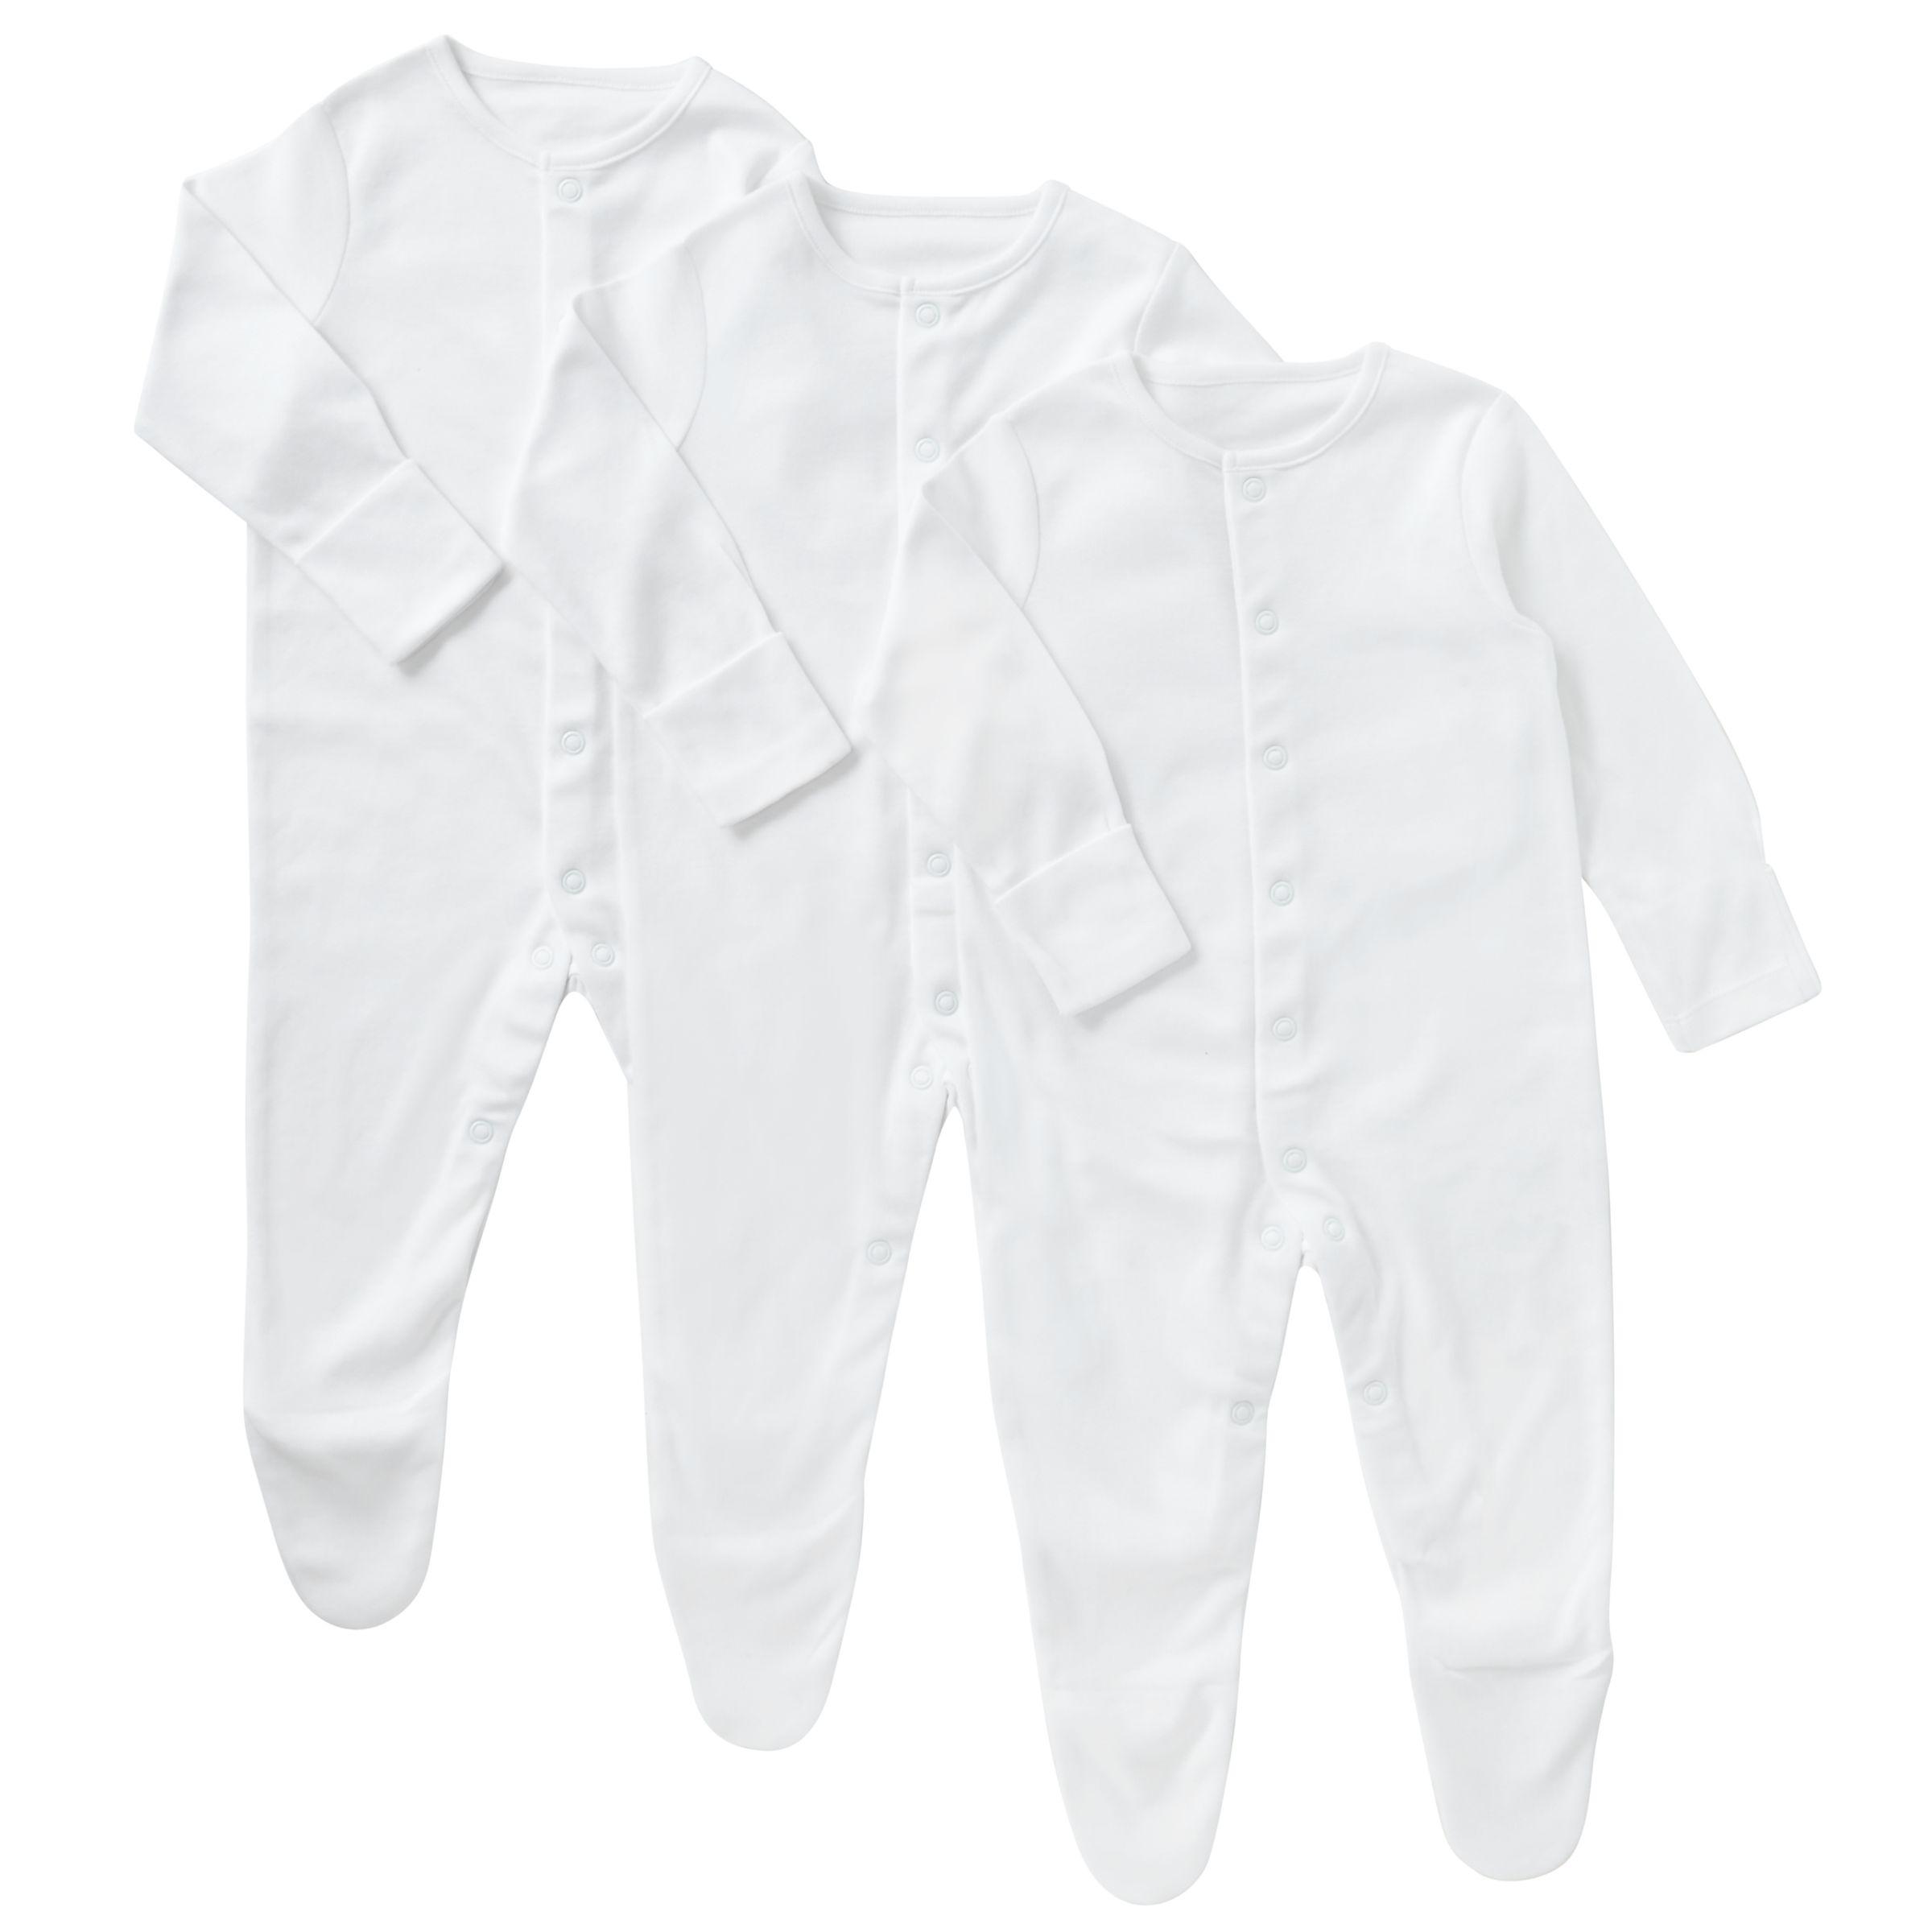 John Lewis Baby Pima Cotton Sleepsuit Pack of 3 White at John Lewis